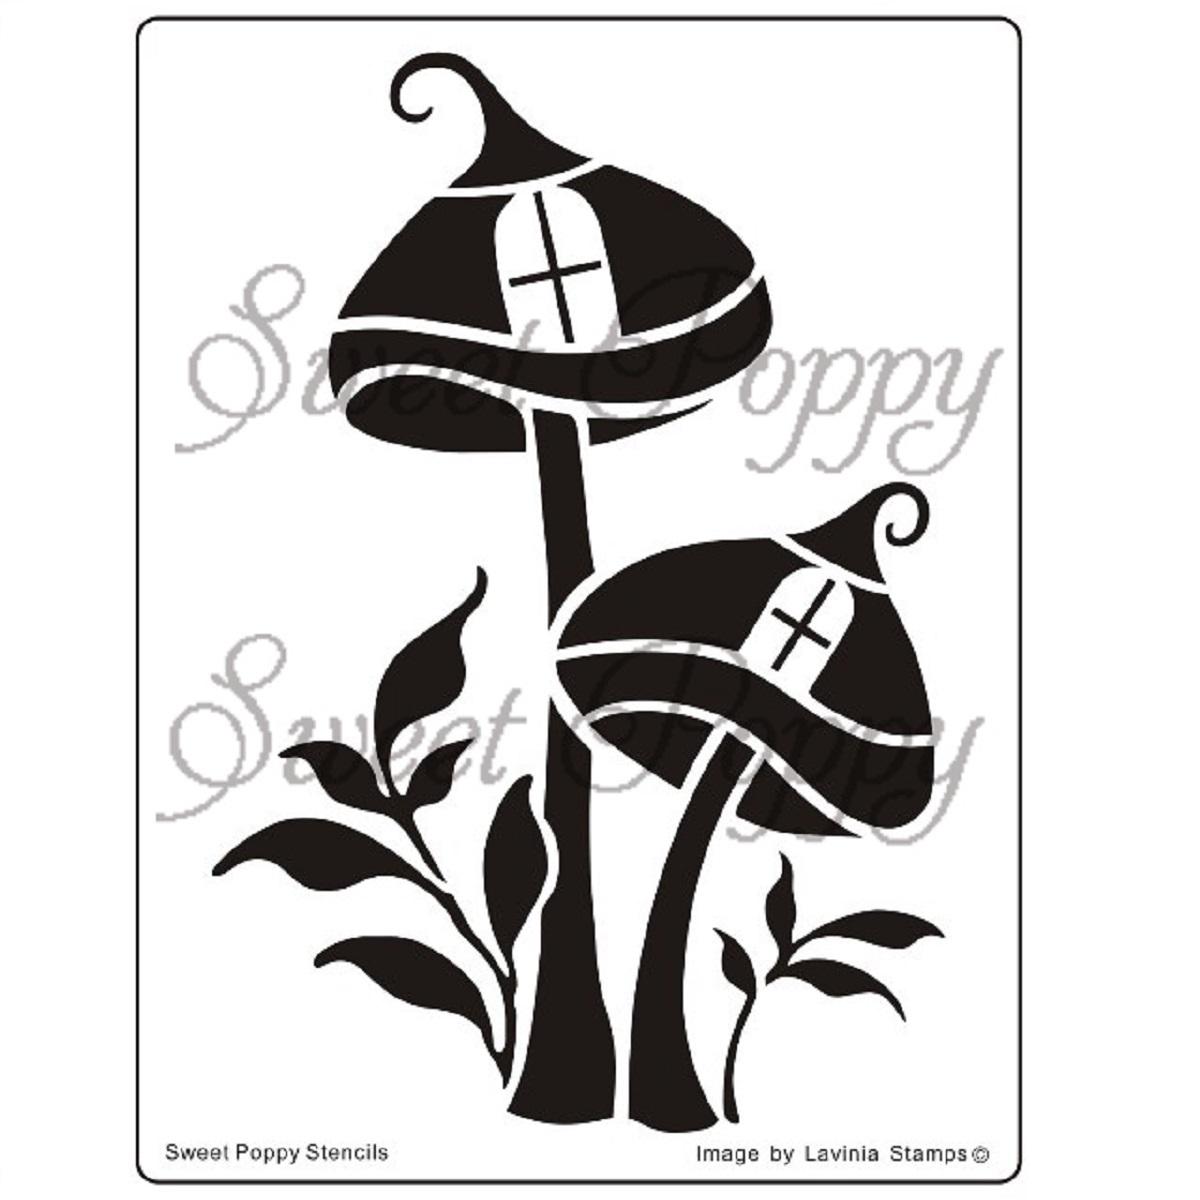 Sweet Poppy Stencil: Mushroom Dwelling